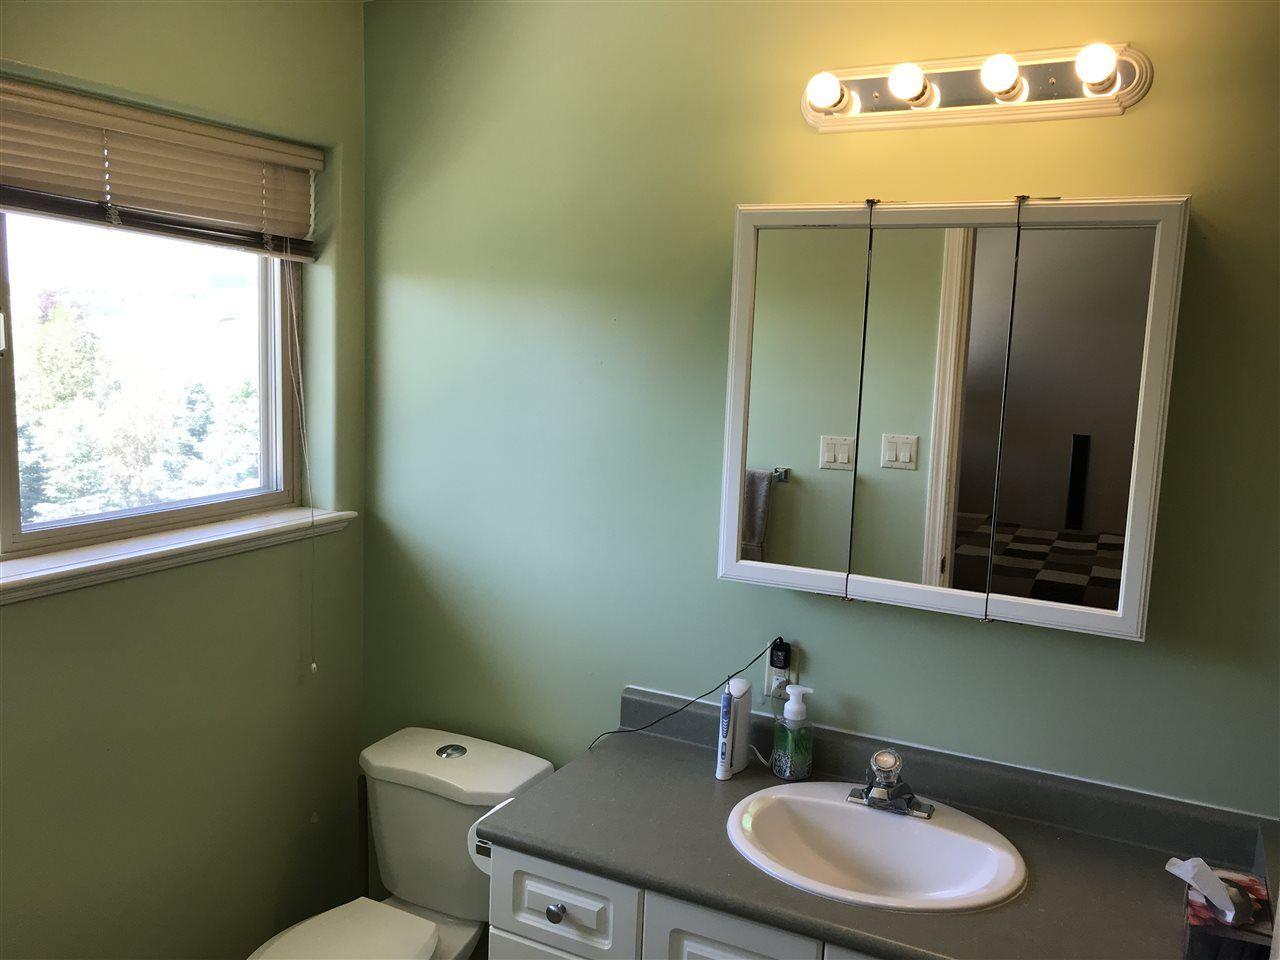 Photo 10: Photos: 11404 108 Street in Fort St. John: Fort St. John - City NW House for sale (Fort St. John (Zone 60))  : MLS®# R2540806